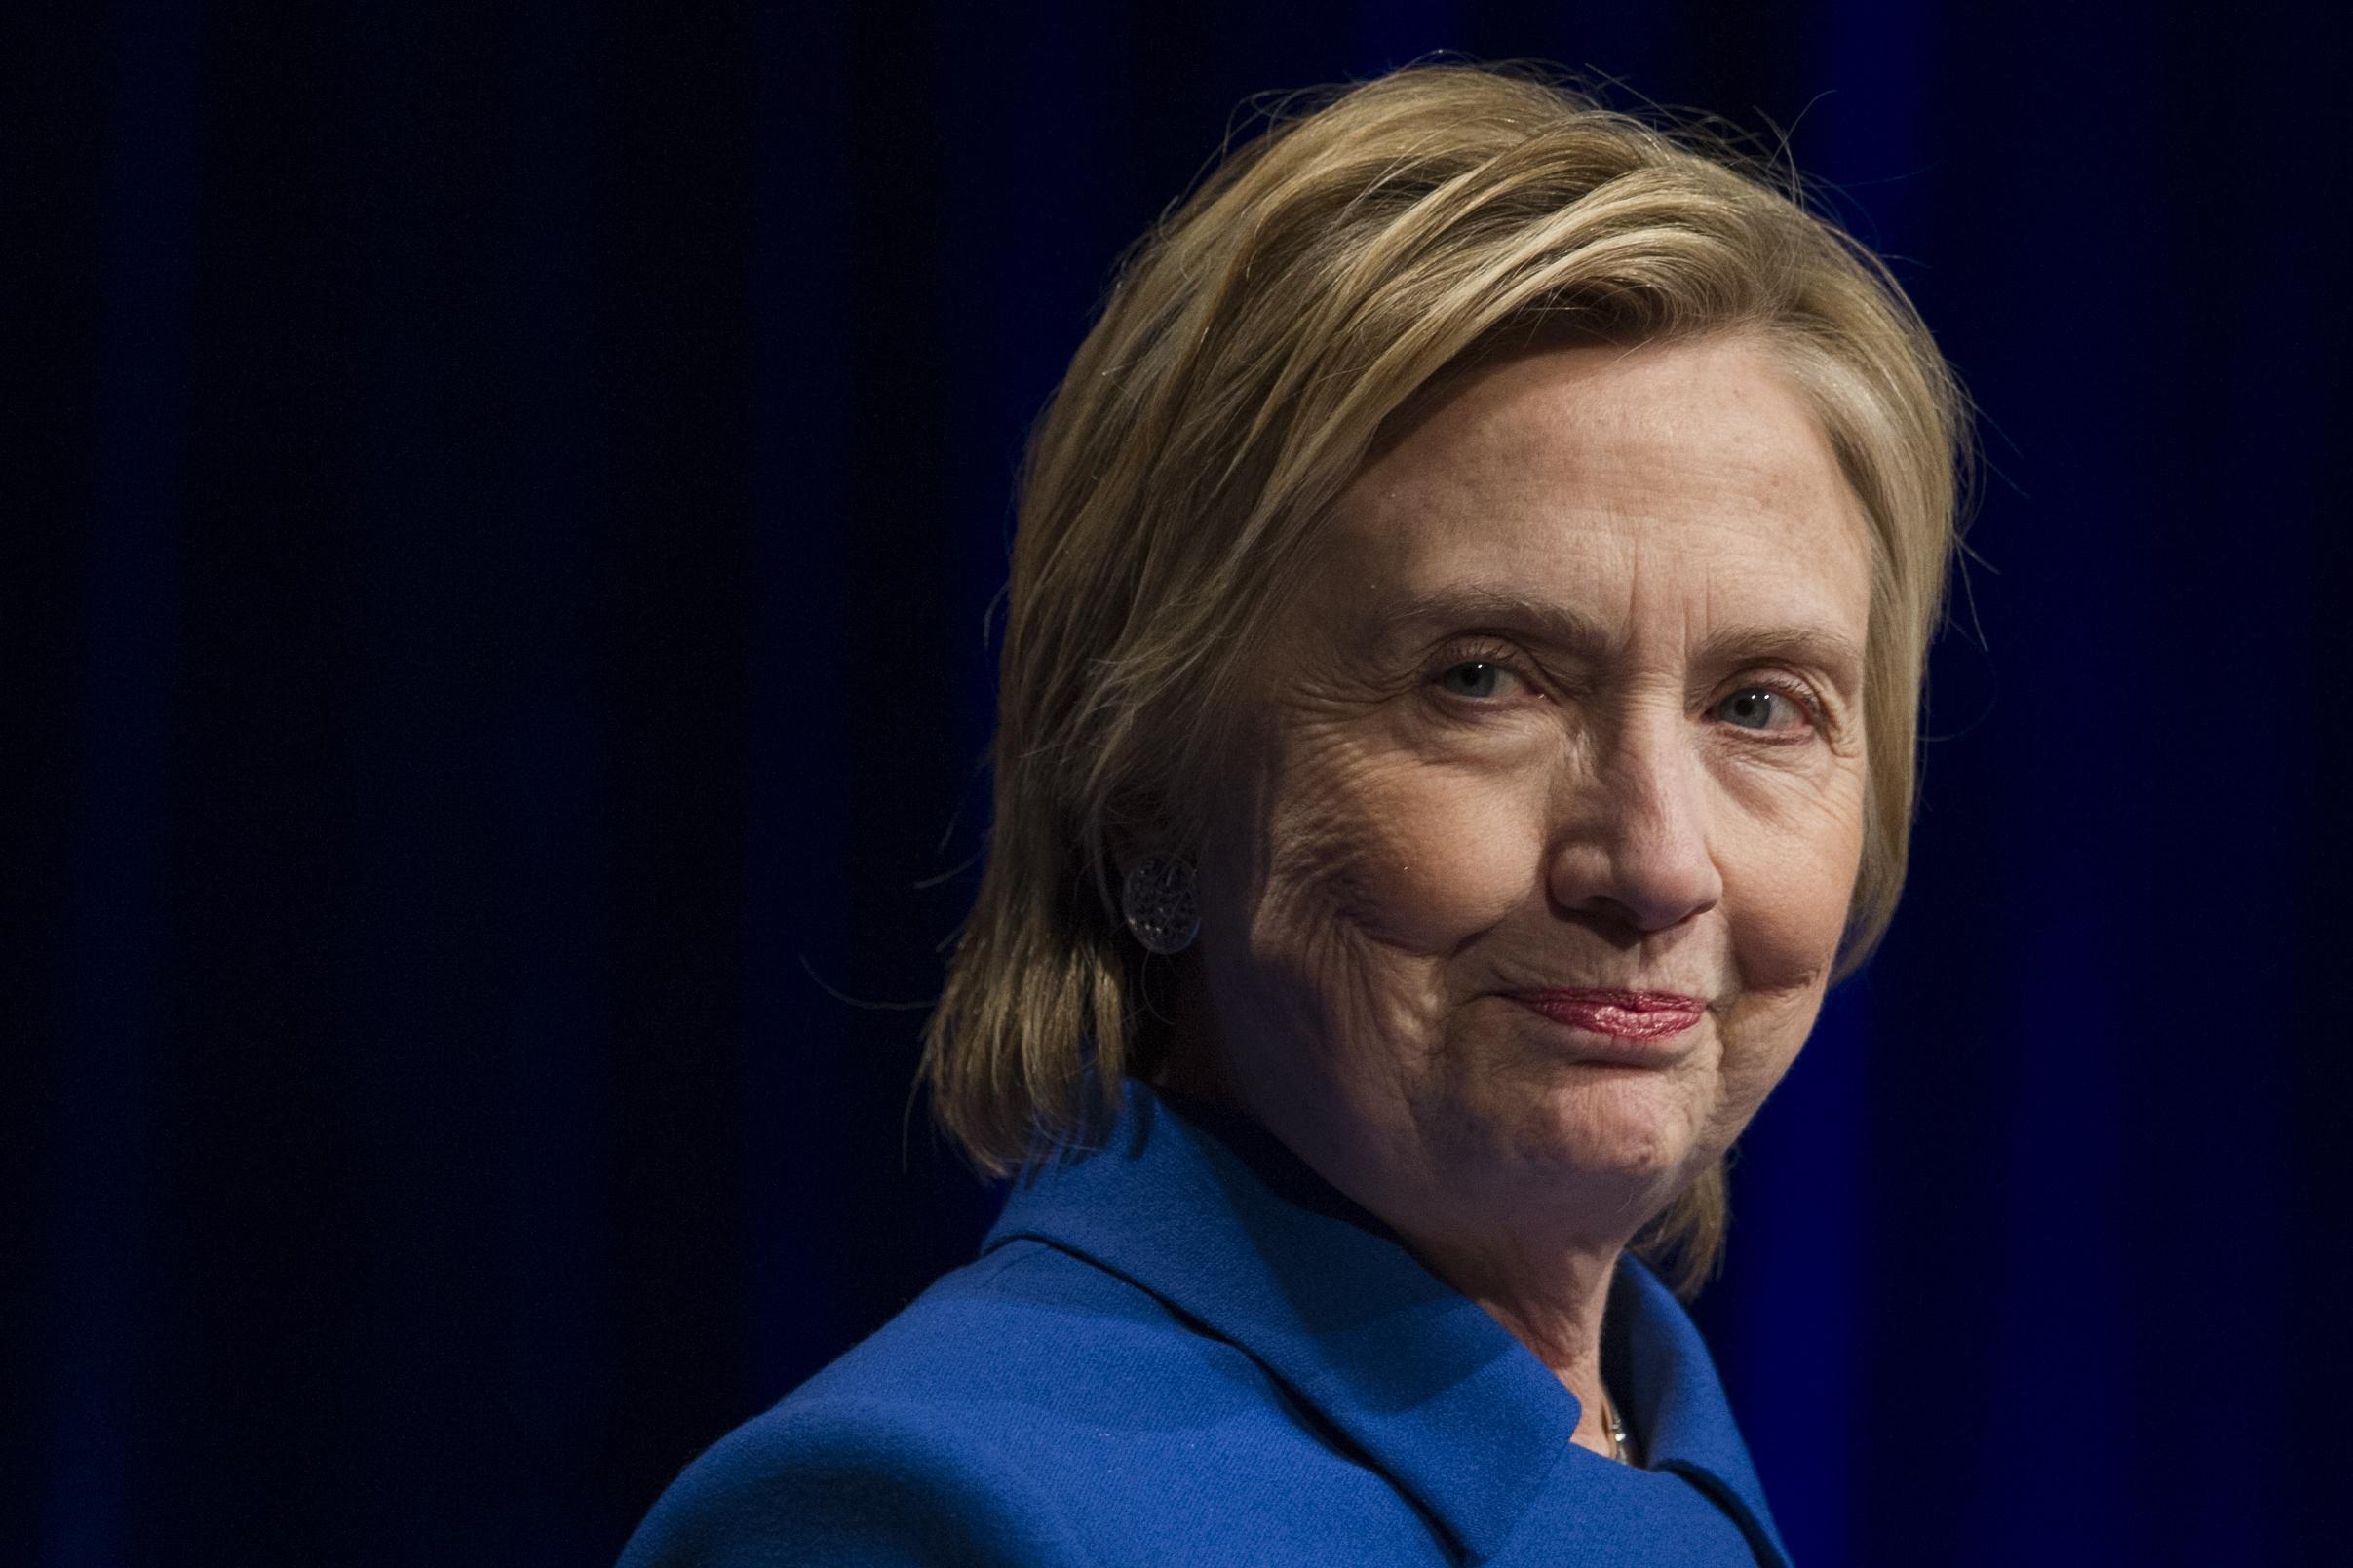 sessions as ag could mean renewal of clinton email probe washington  times. Hillary Clinton No Makeup Cnn   Mugeek Vidalondon